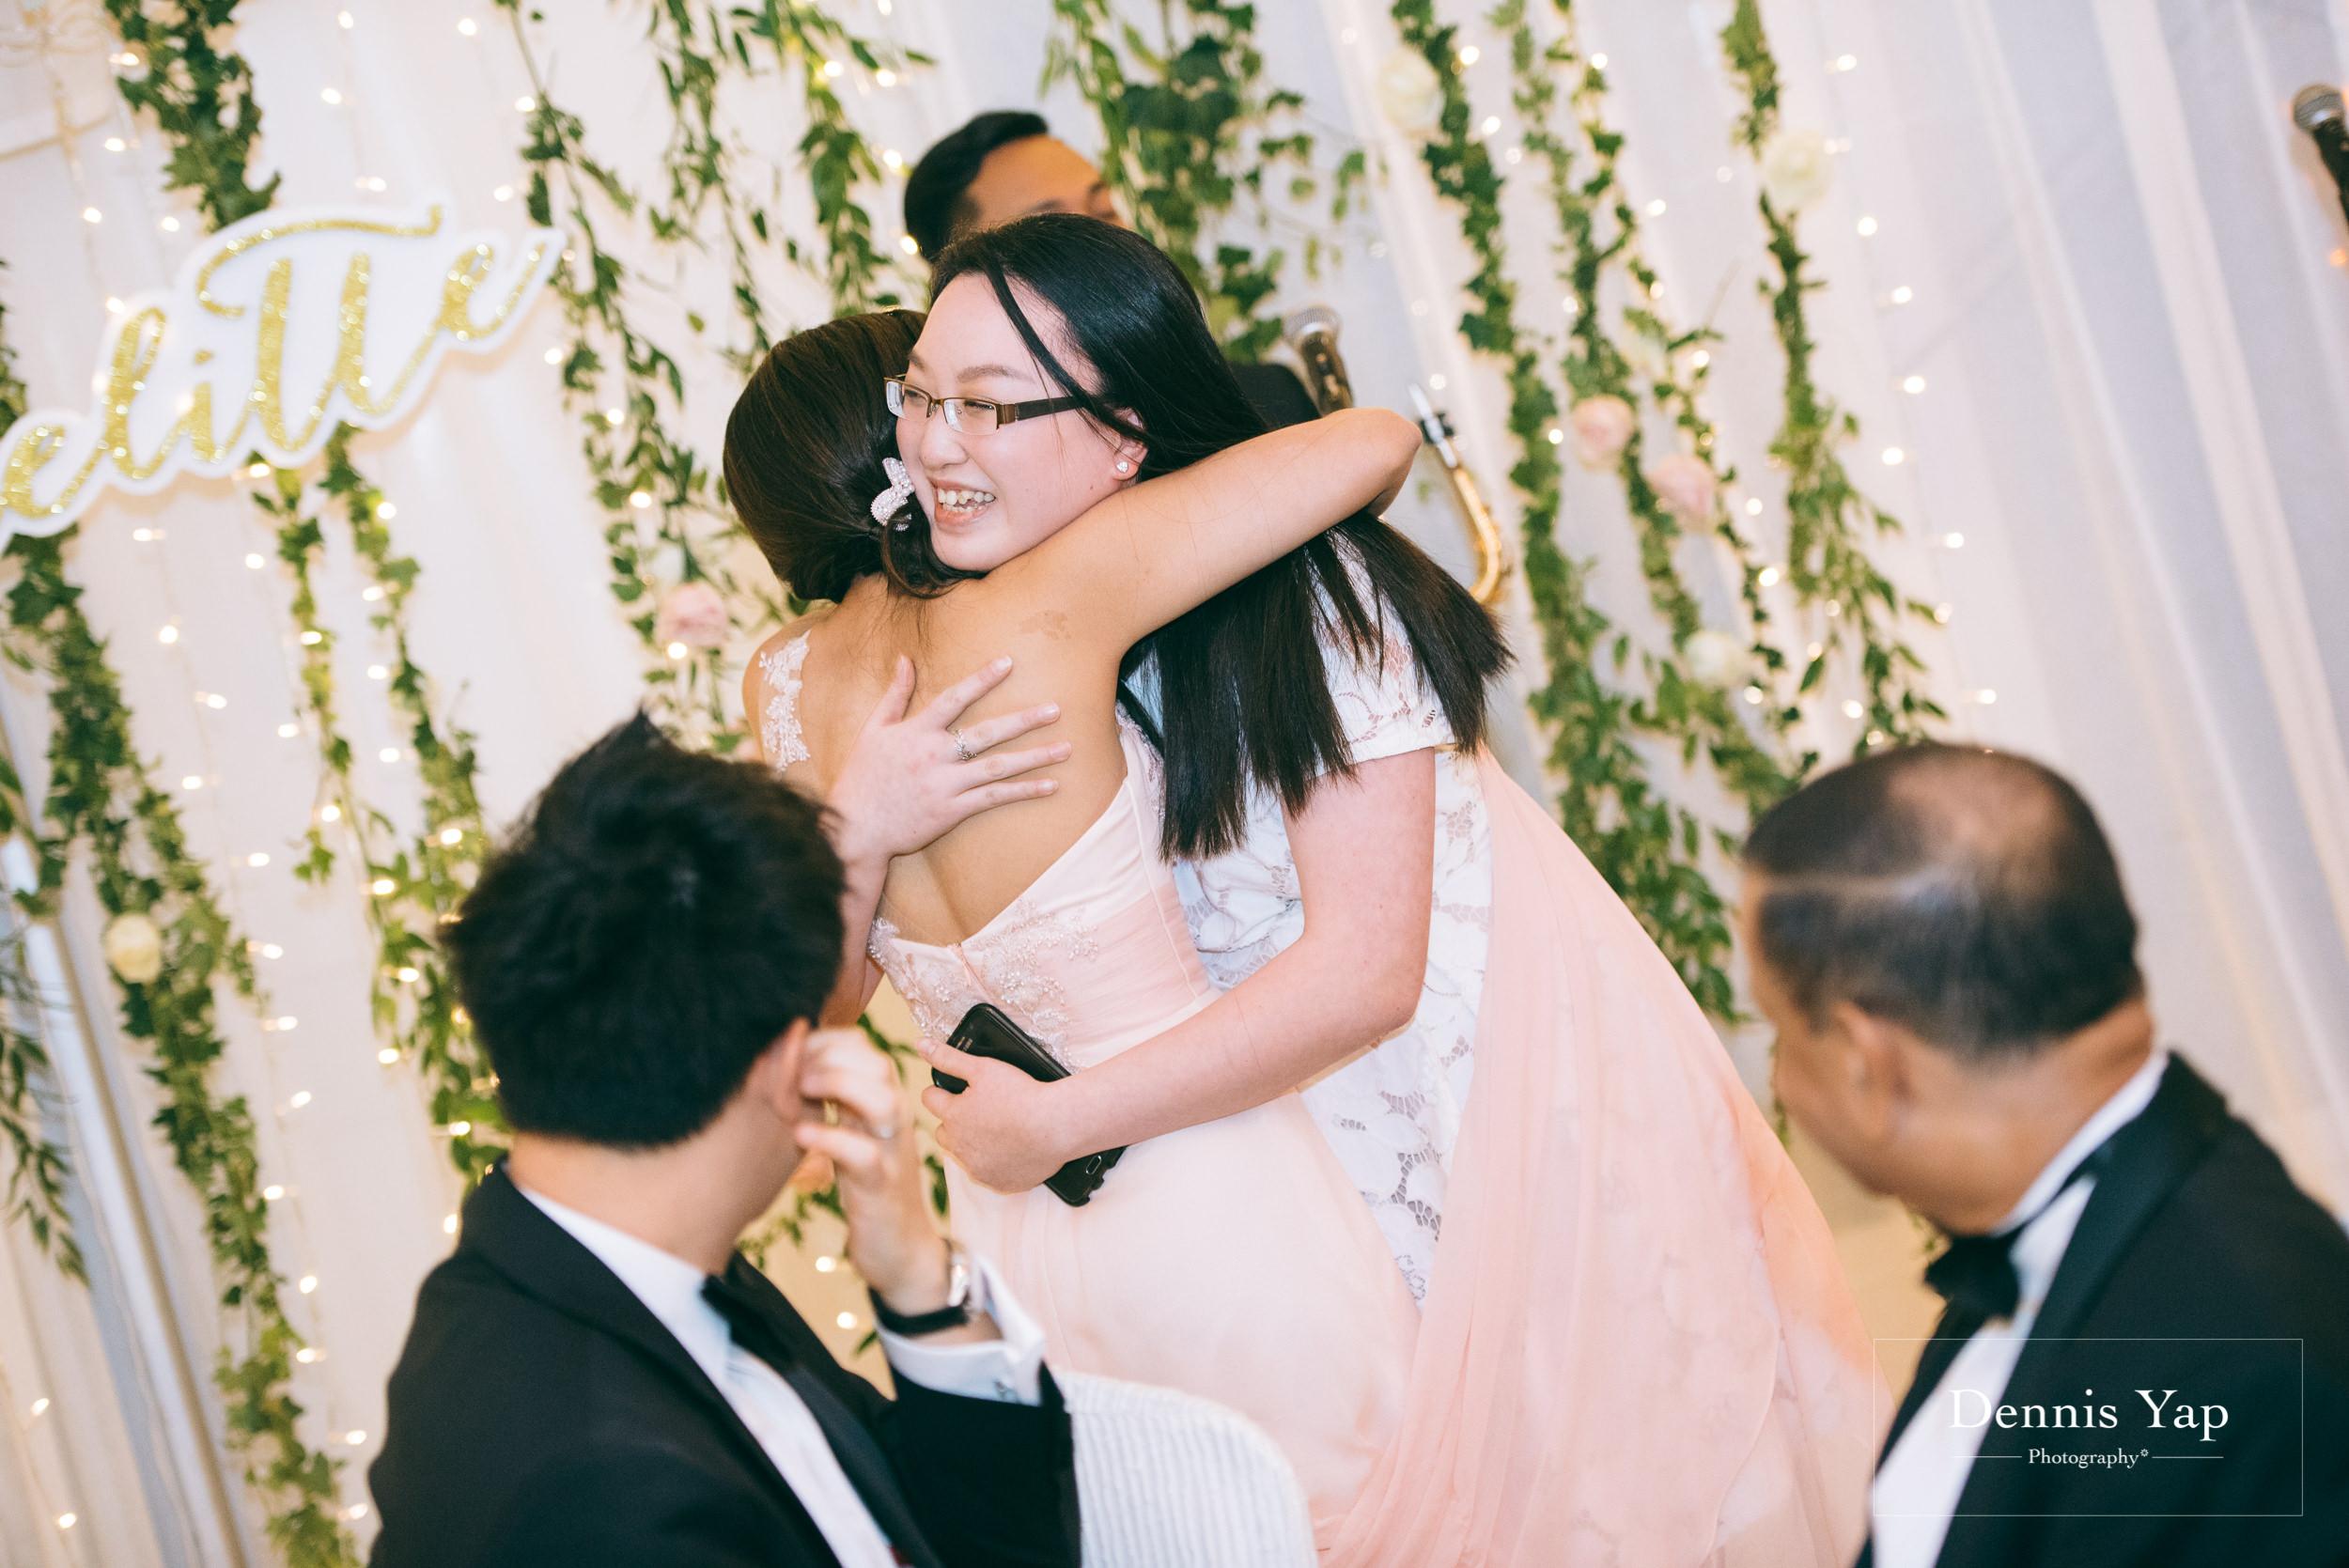 shalini yelitte wedding dinner rasa sayang resort penang dennis yap photography malaysia top wedding photographer beloved emotions flow -34.jpg